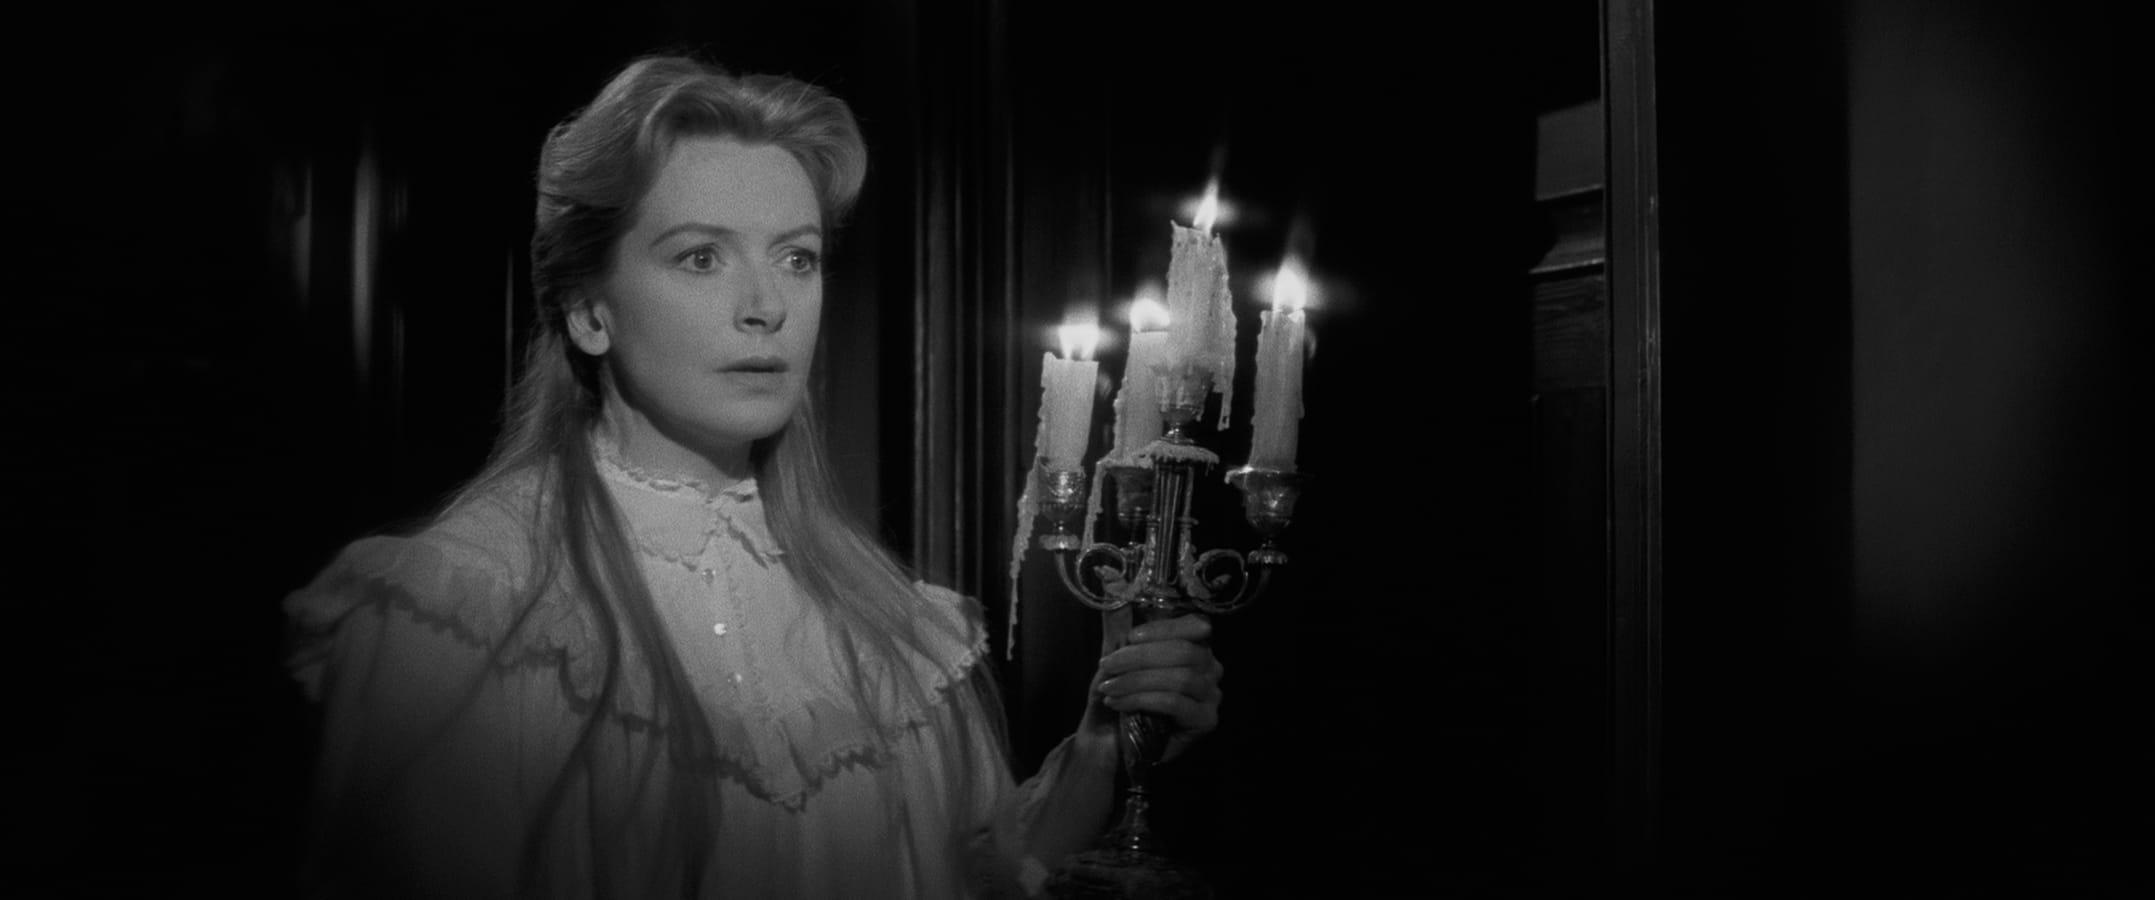 innocents - بهترین فیلم های ترسناک تاریخ سینما